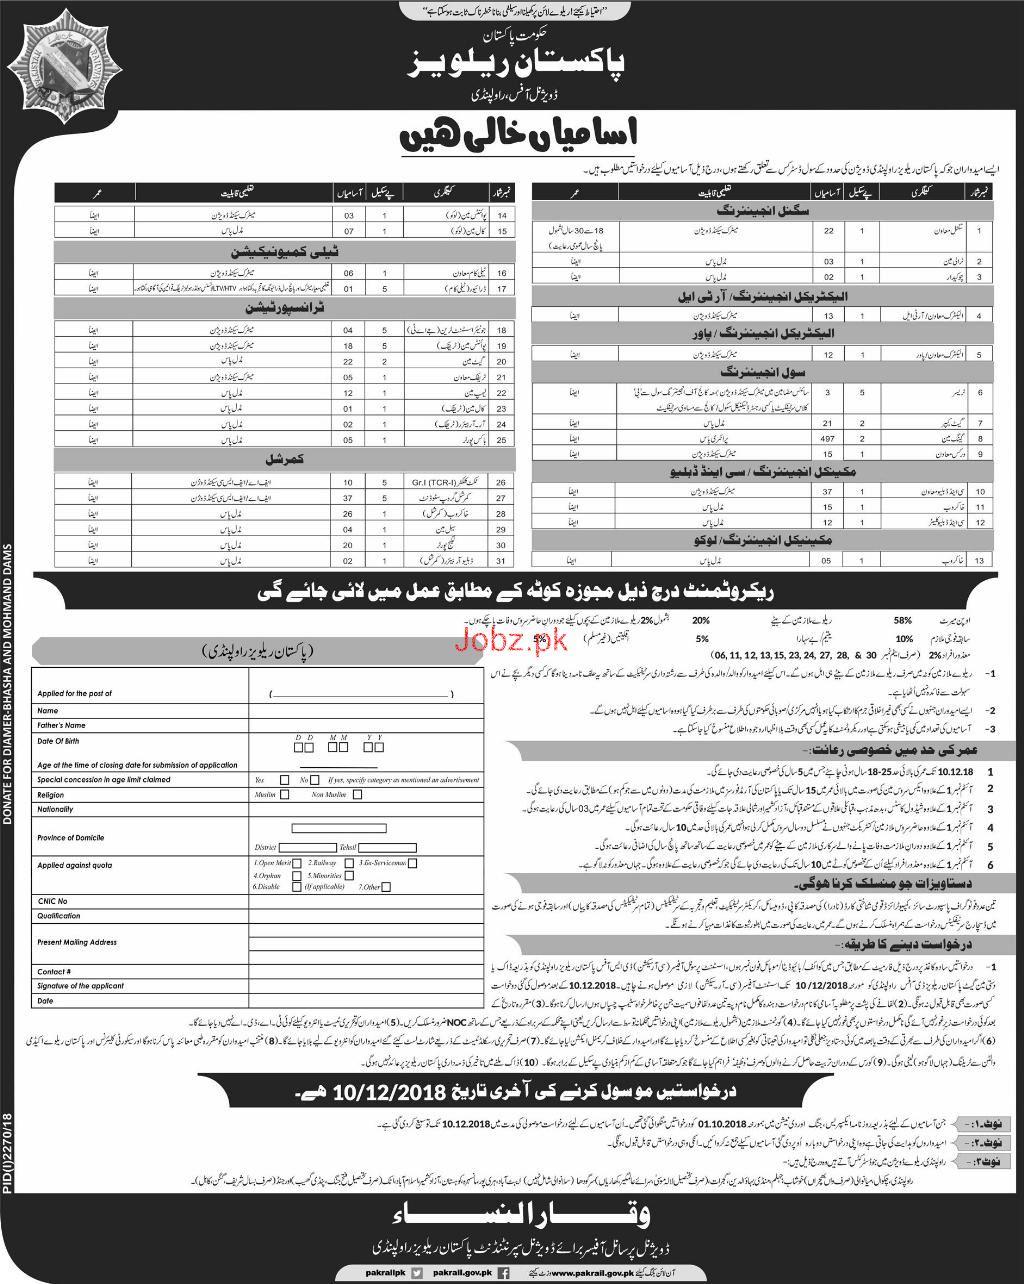 Pakistan Railway Divisional Office Rawalpindi Jobs